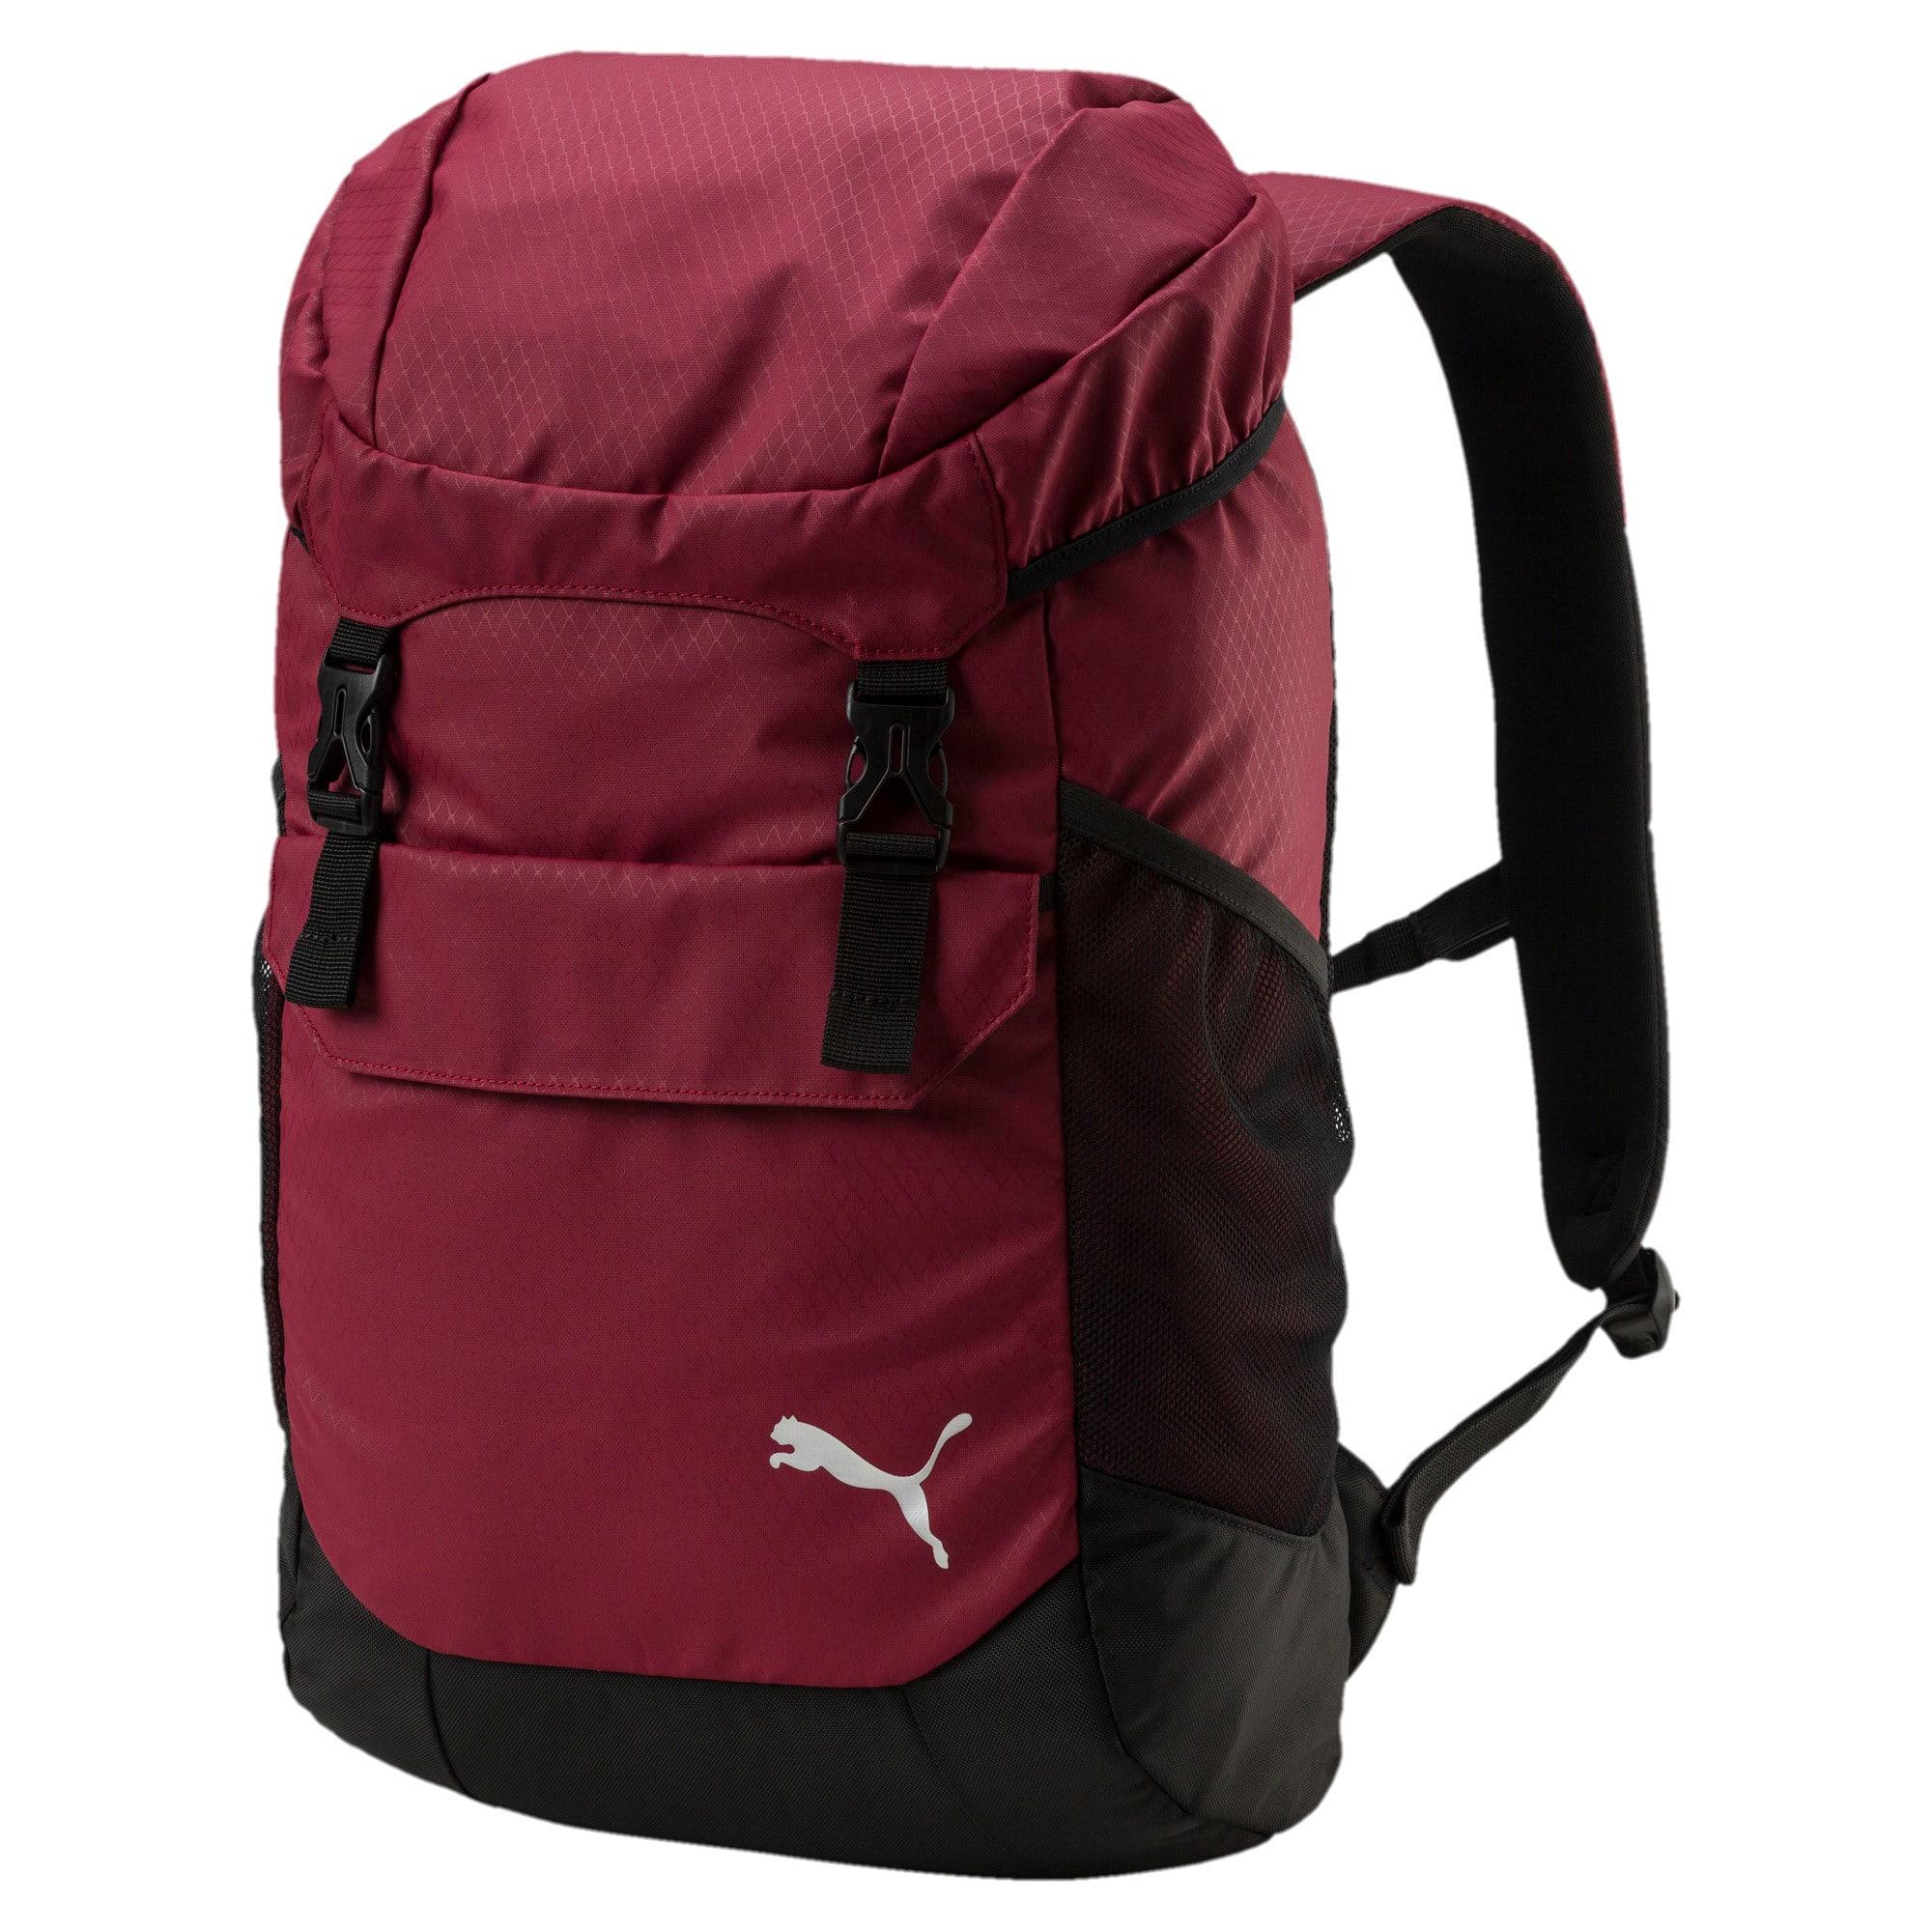 Thumbnail 1 of Training Daily Backpack, Pomegranate-Puma Black, medium